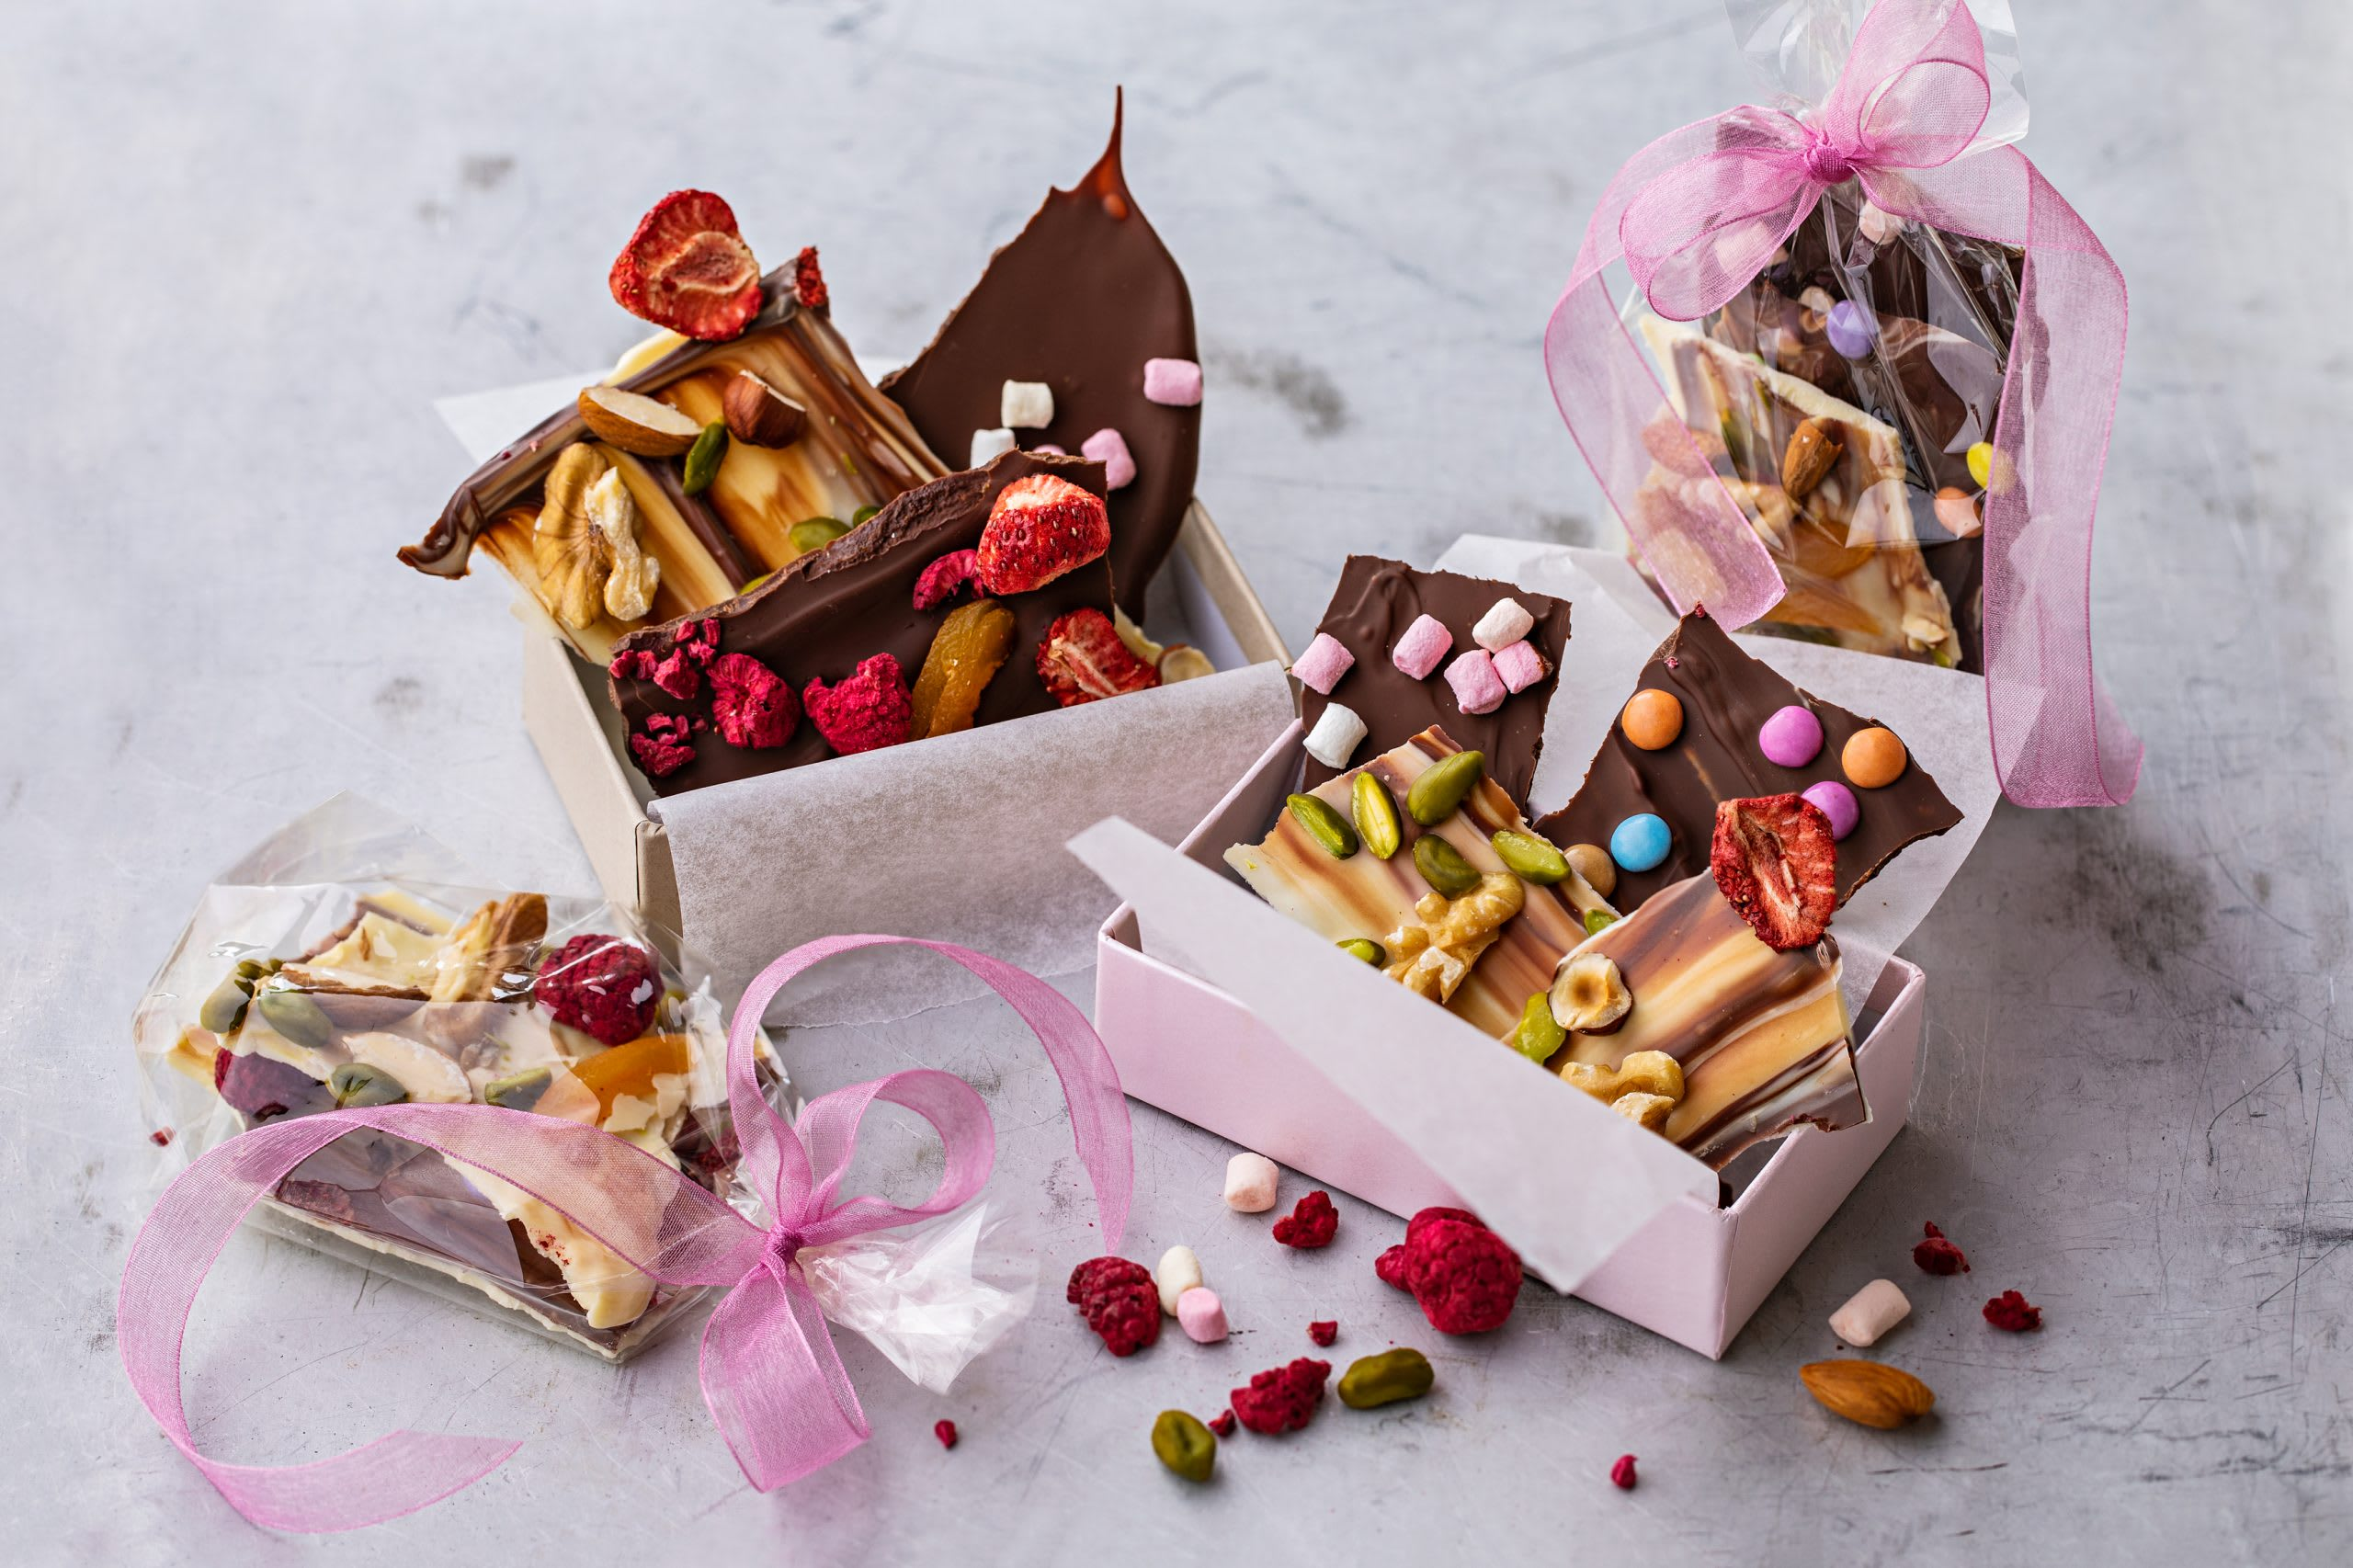 Schokoladen-Geschenk (Bruchschokolade)